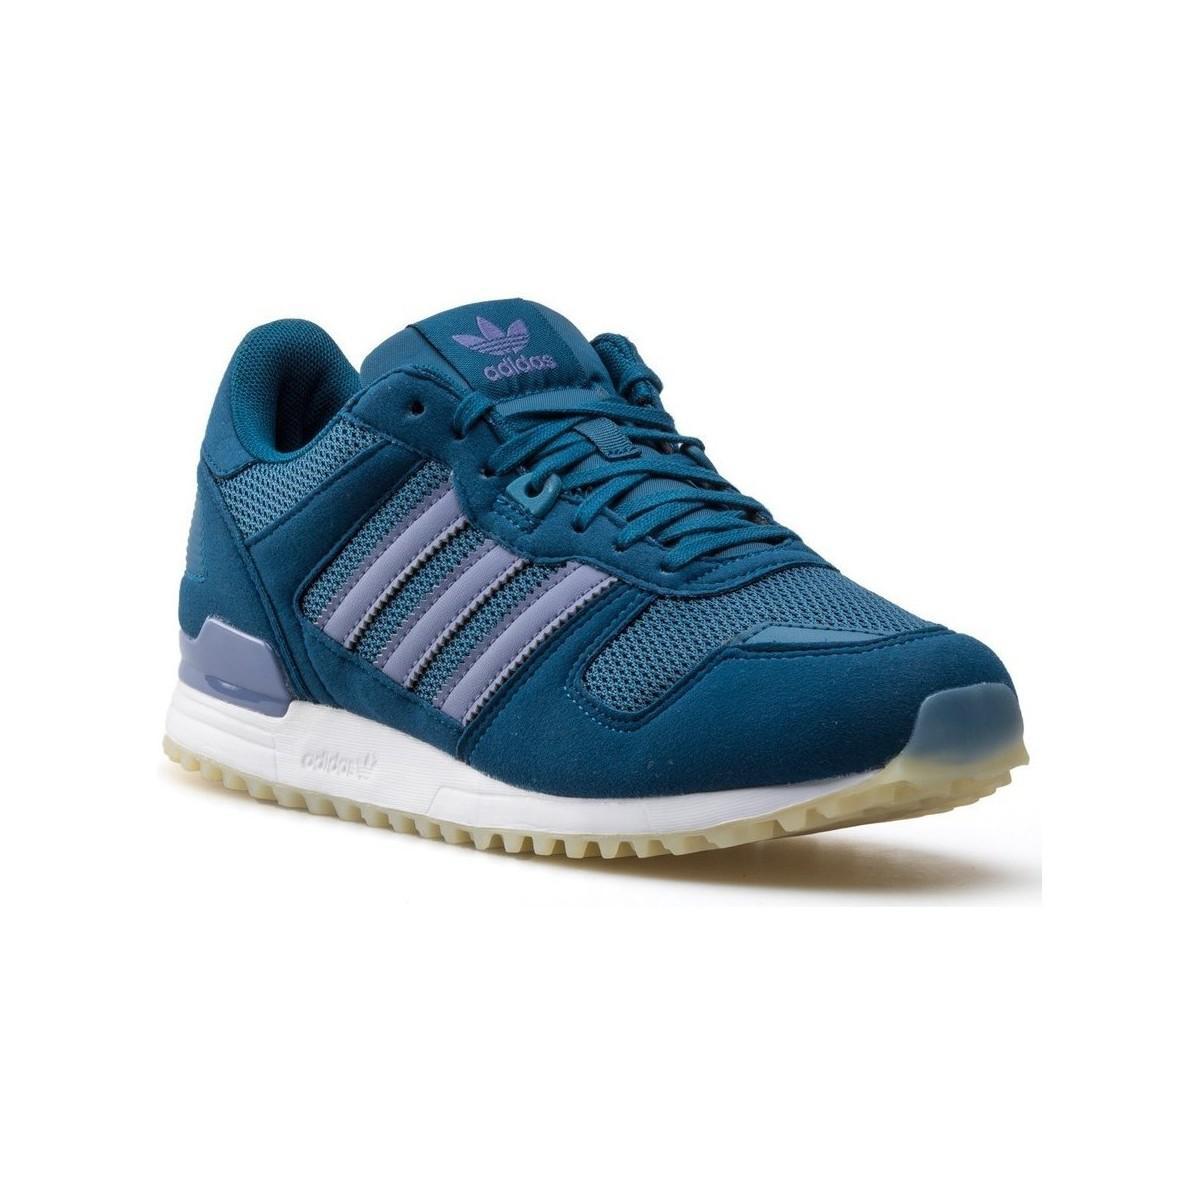 best service 10ddf e6c81 ... shoes white blue red x25g5140 b6d01 7e1f2  where to buy adidas. blue zx  700 w 9d970 9c68a